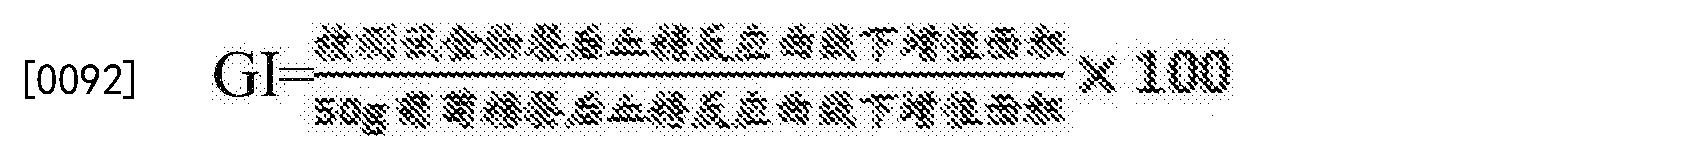 Figure CN106858317AD00081